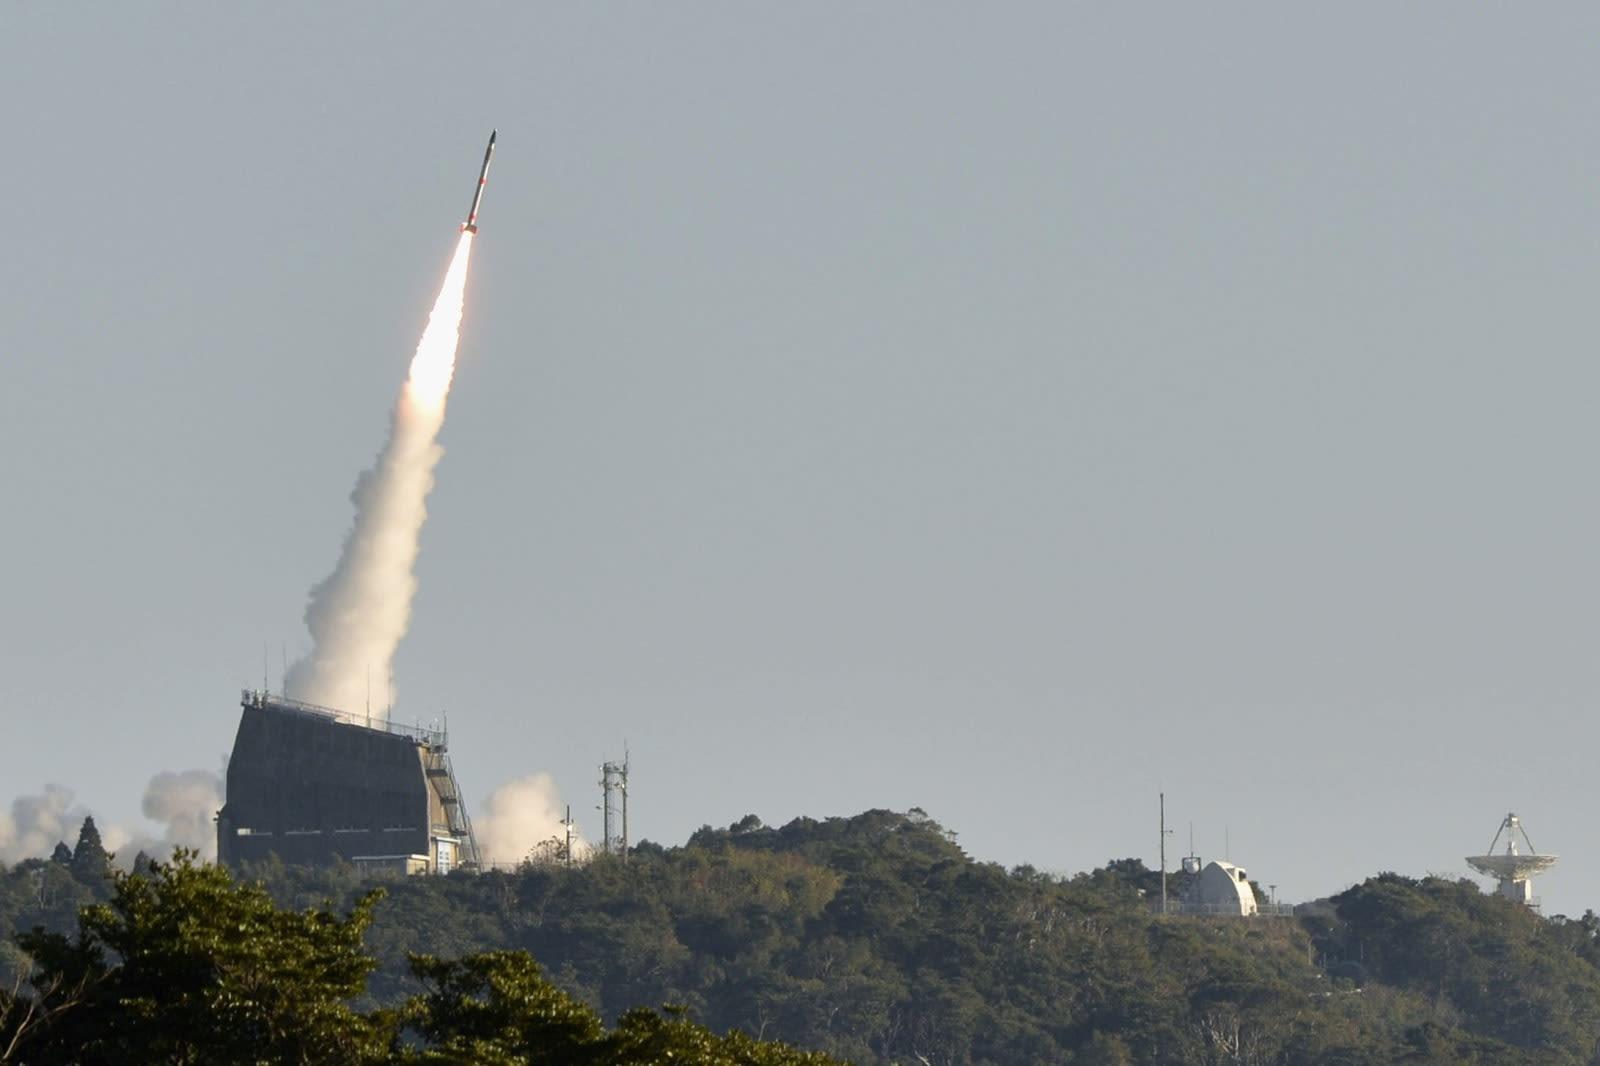 Japans Experimental Mini Rocket Launch Ends In Failure